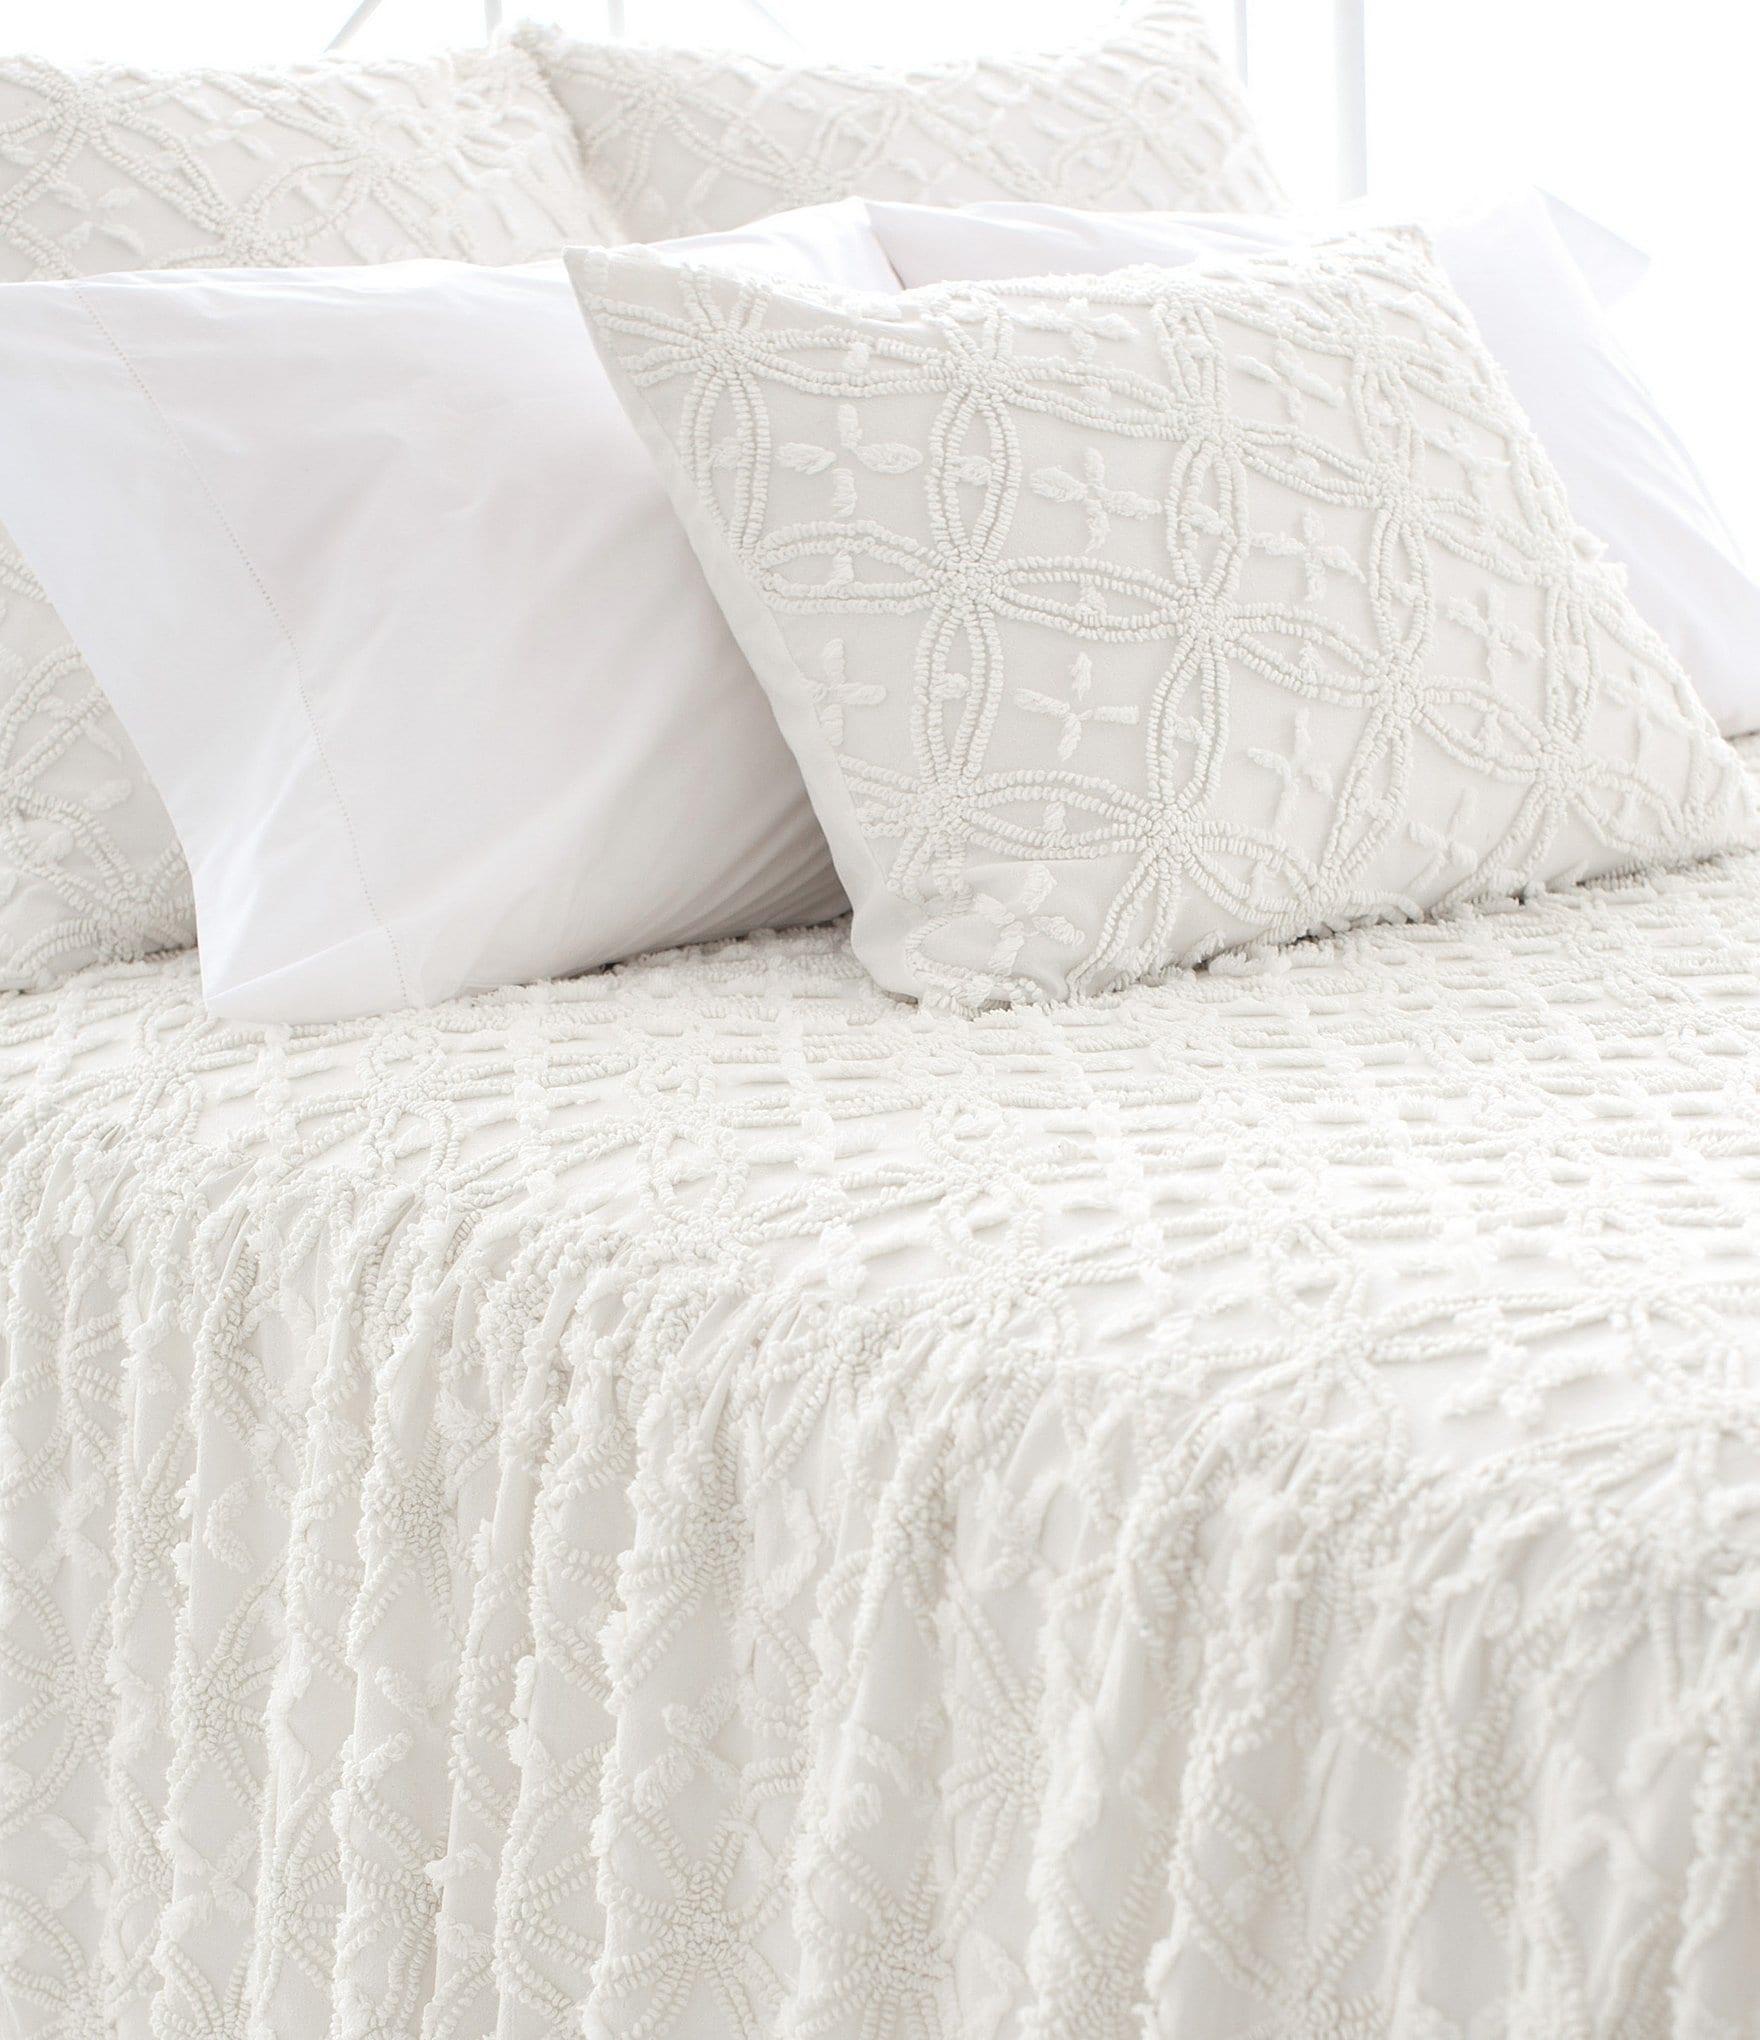 Billabong bedding sets - Billabong Bedding Sets 59